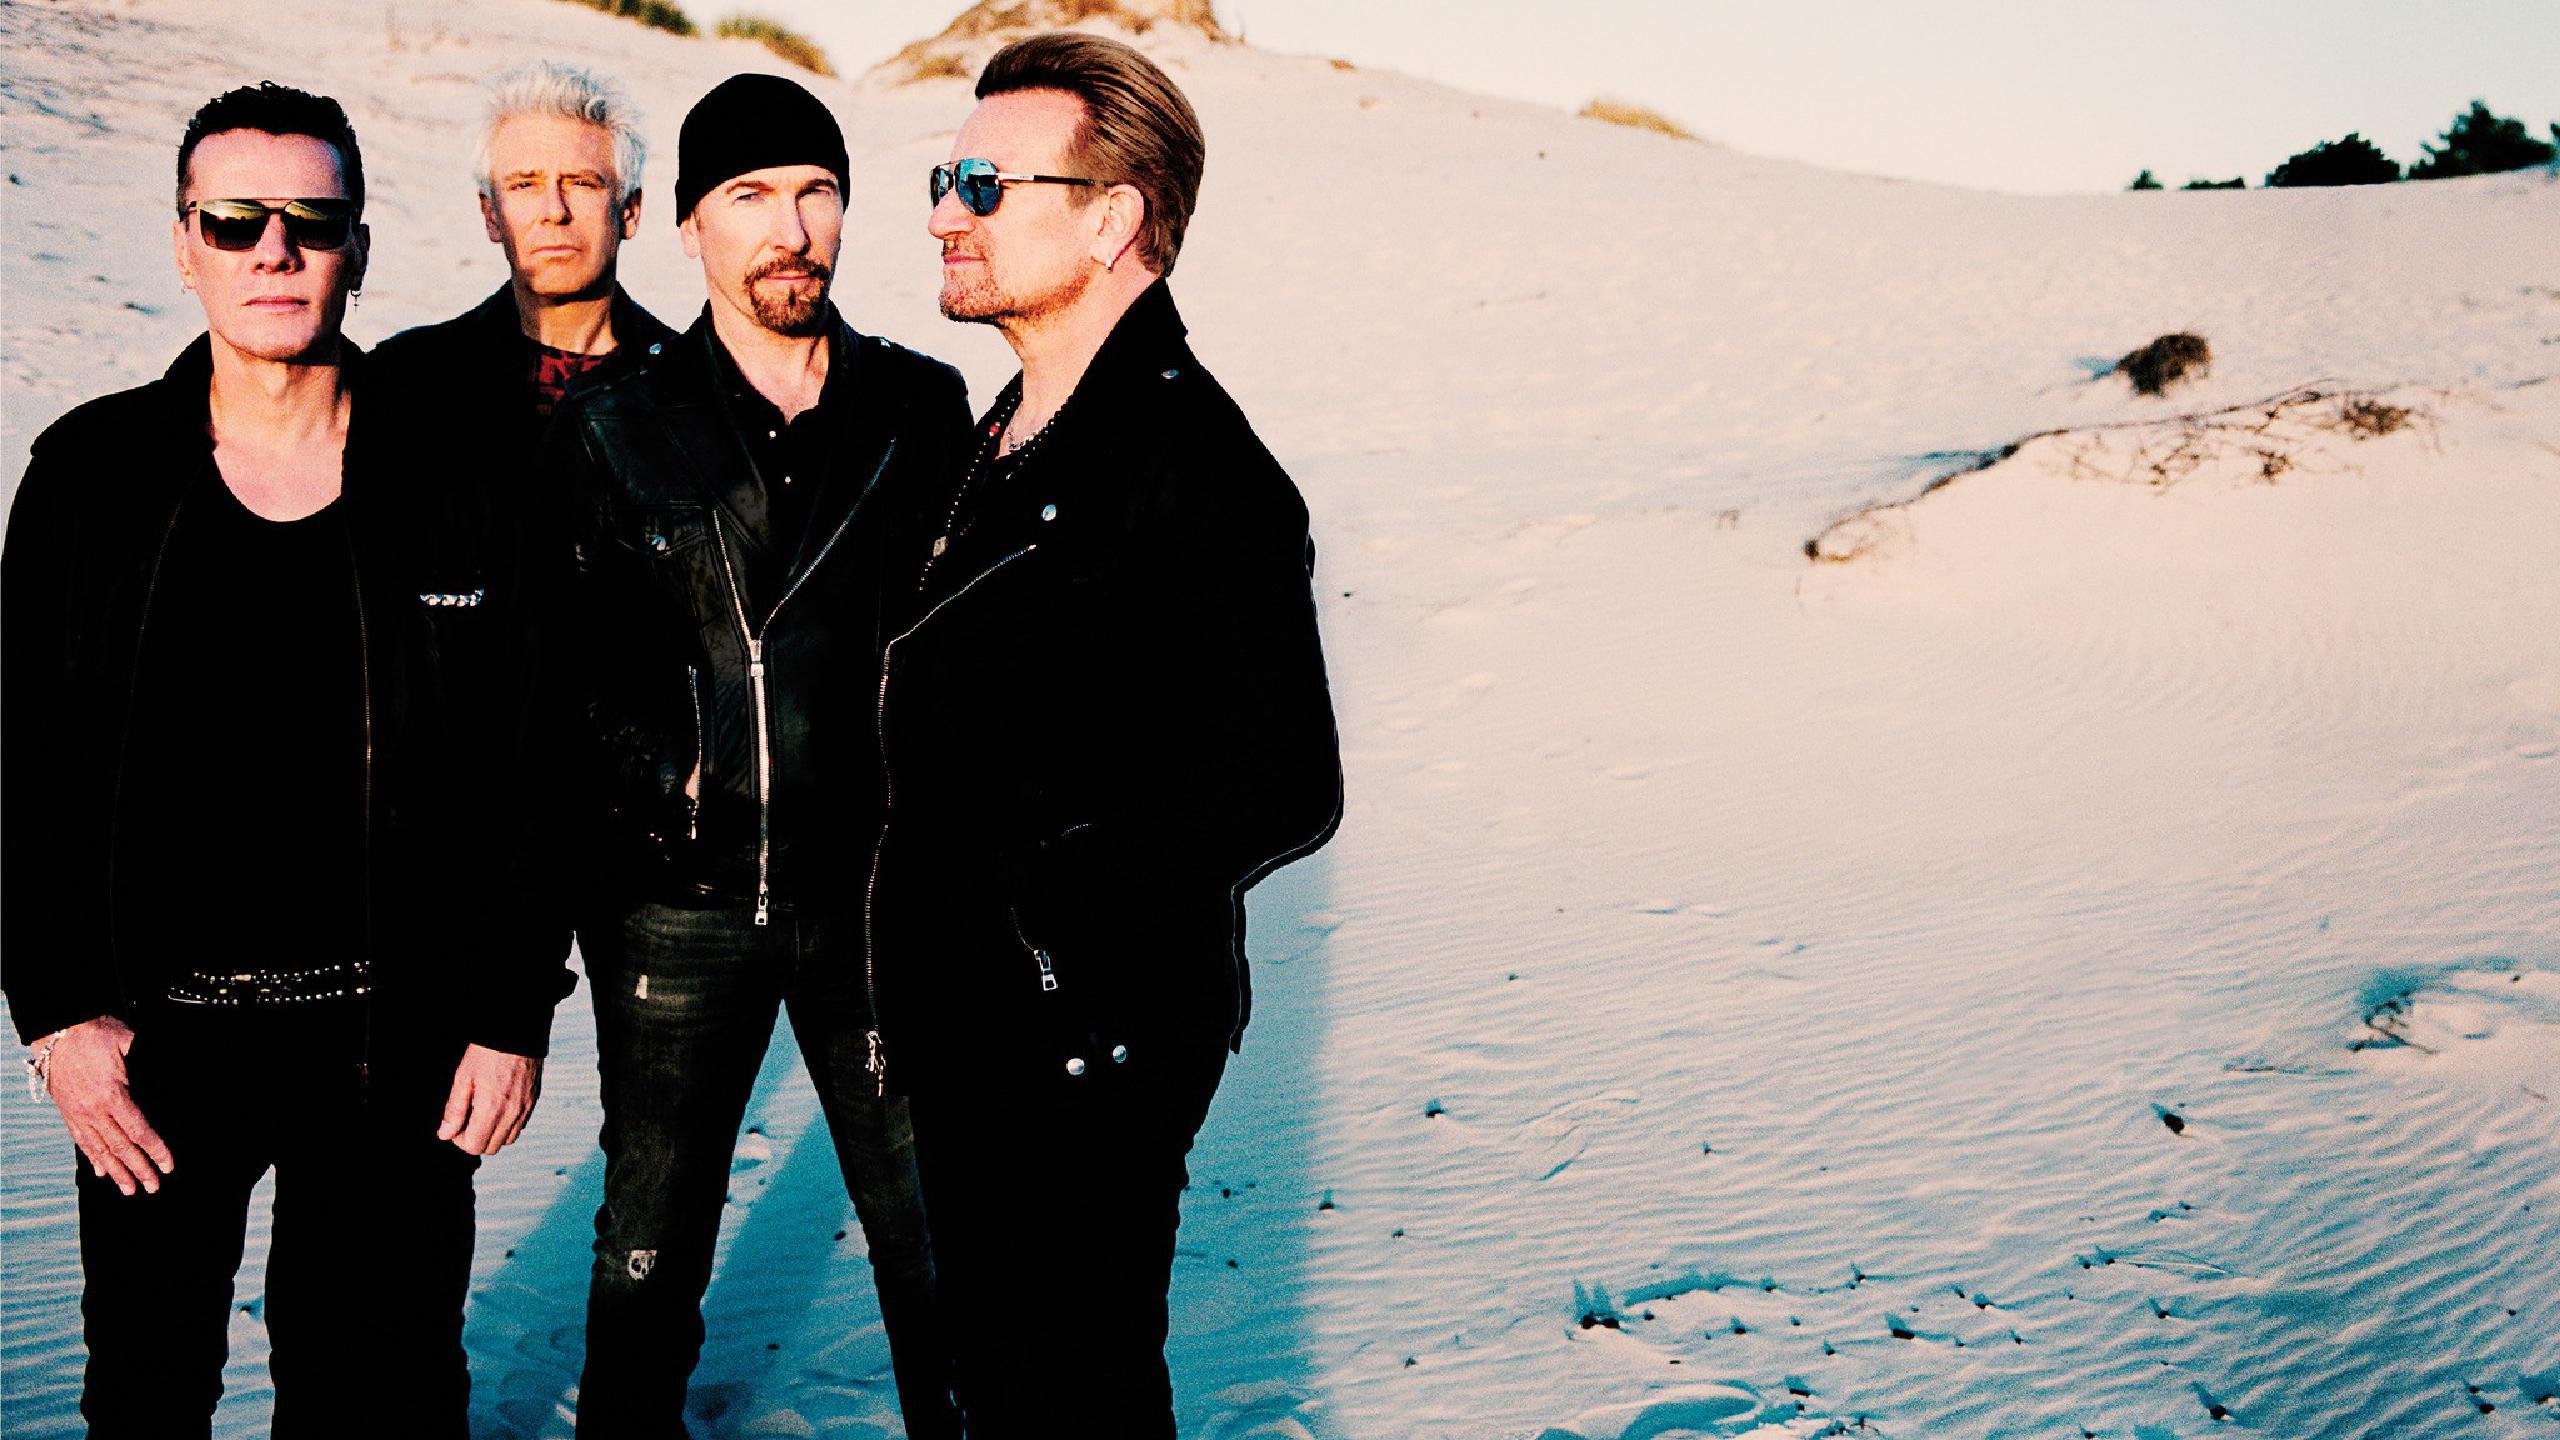 U2 2020 Tour.U2 Tour Dates 2019 2020 U2 Tickets And Concerts Wegow Sweden